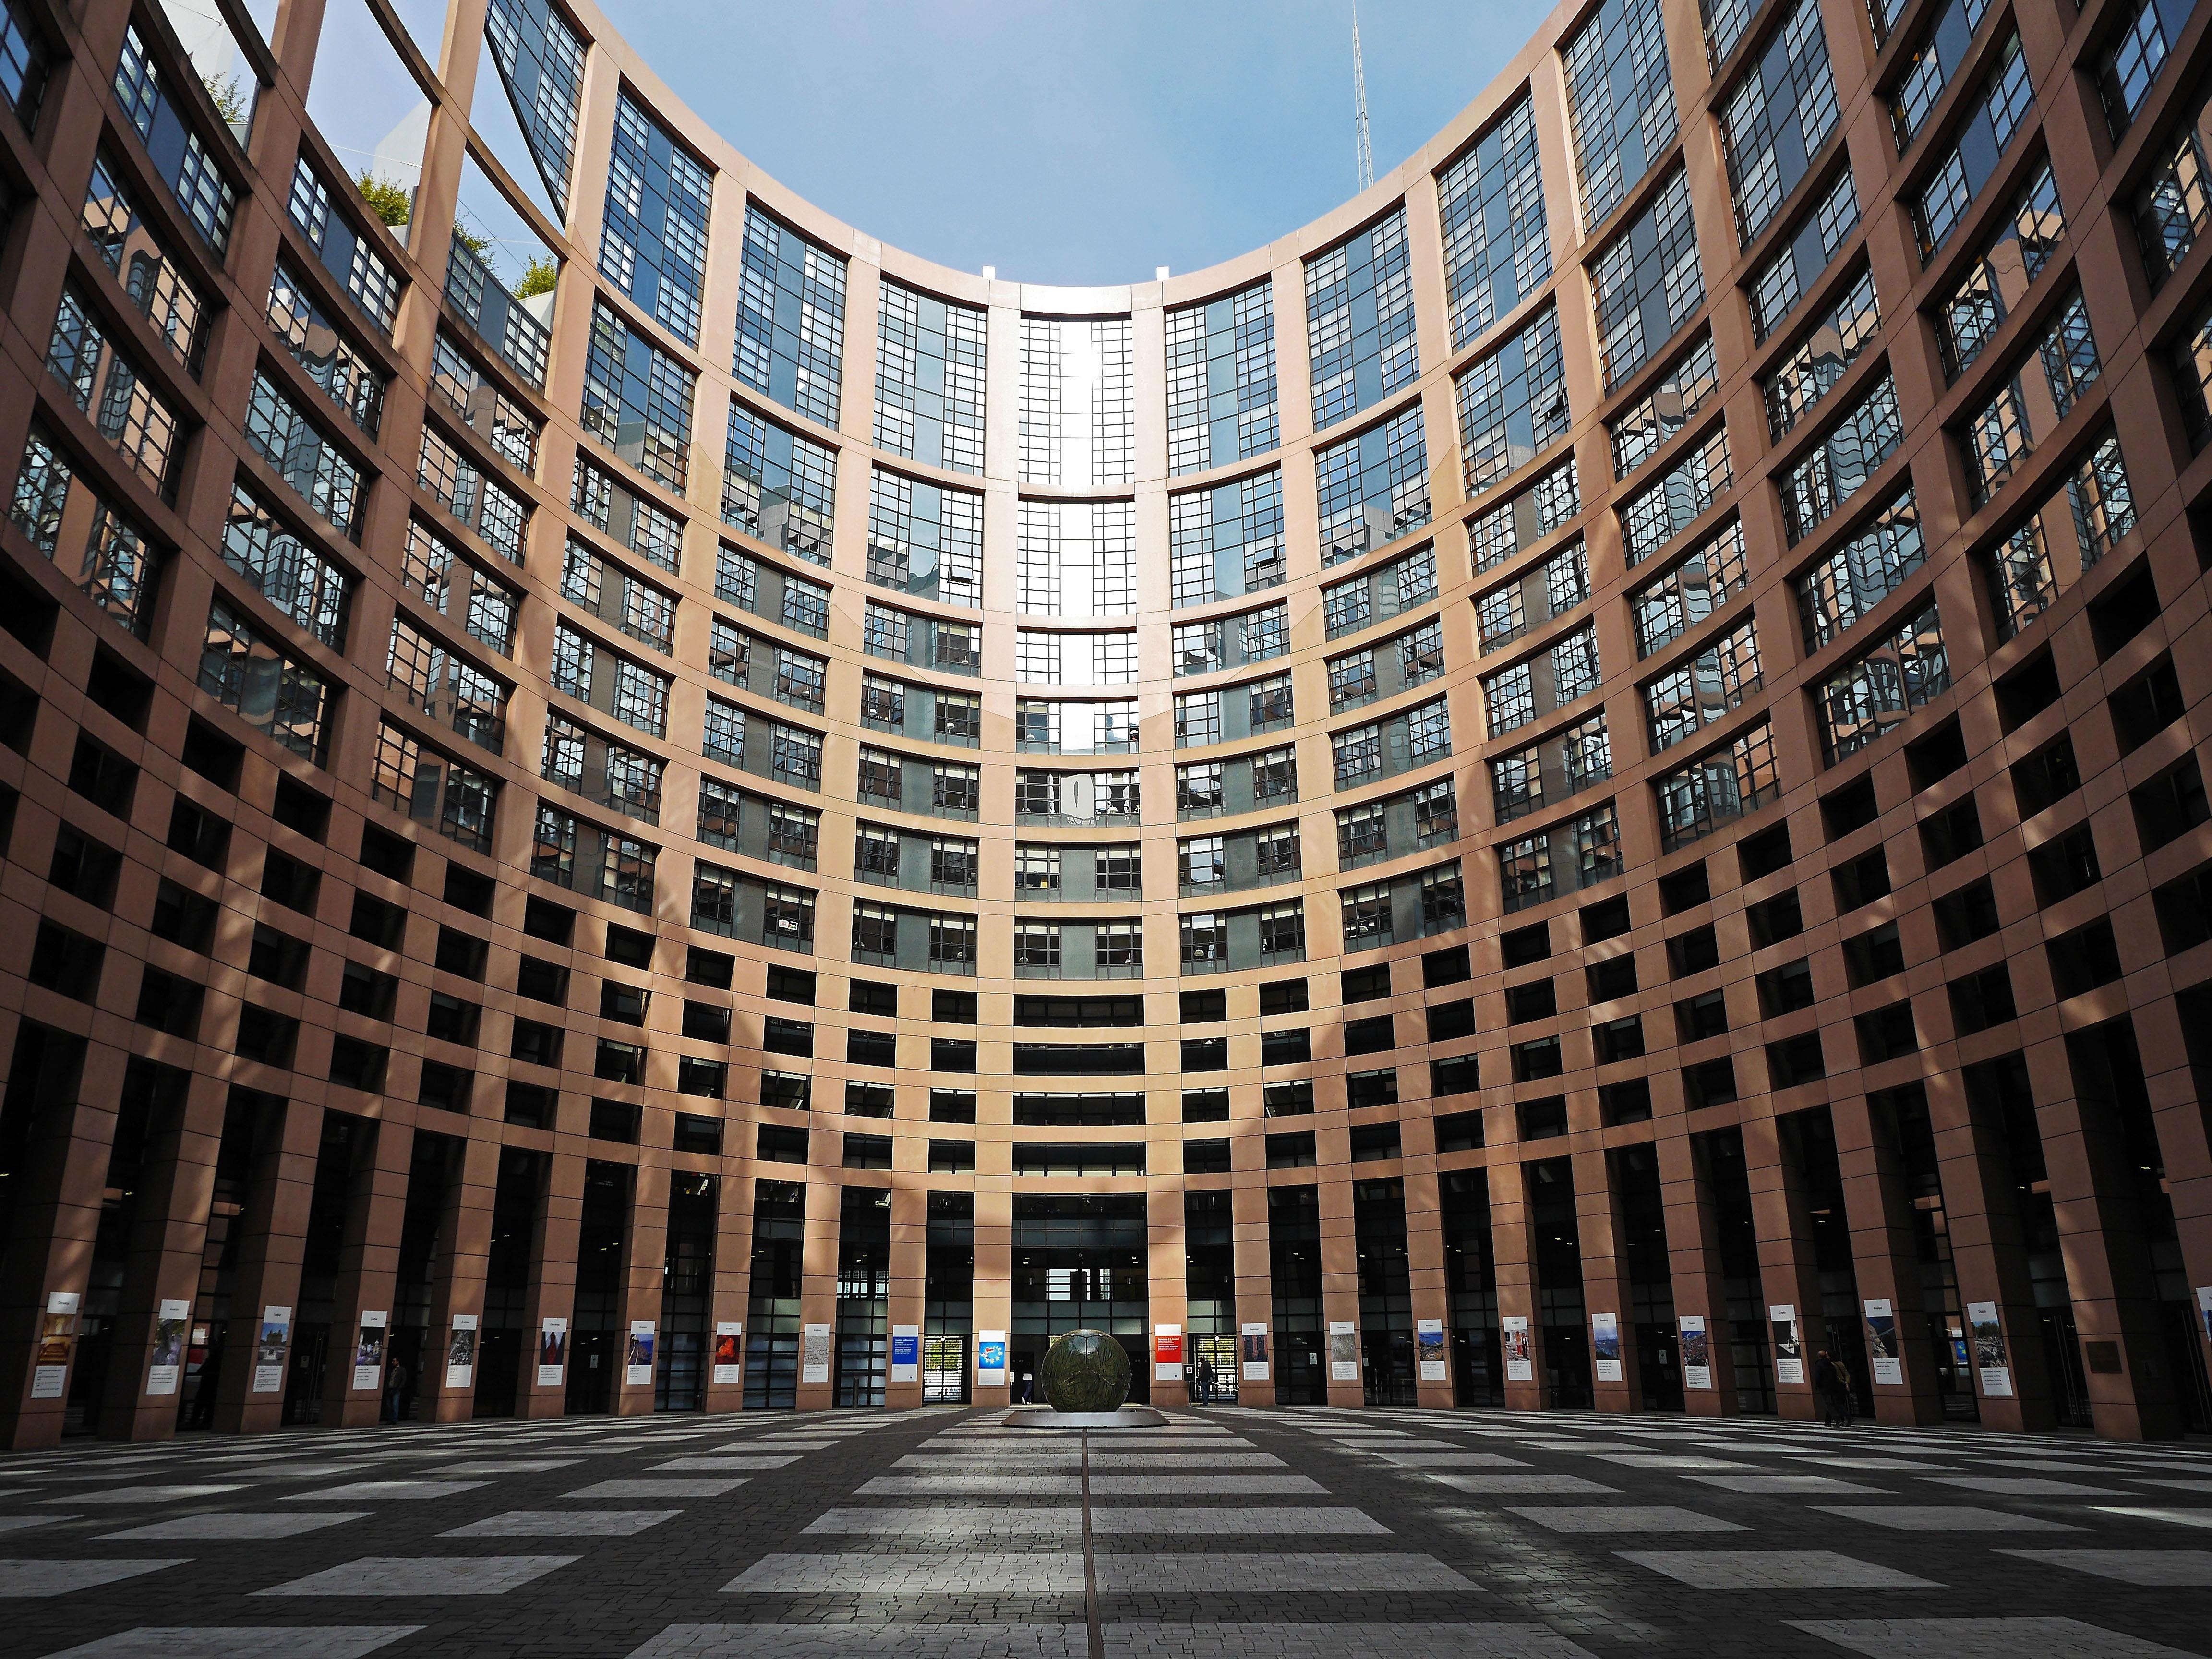 European Parliament resolution criticizes crackdown on dissent ahead of Vietnam Communist Party congress